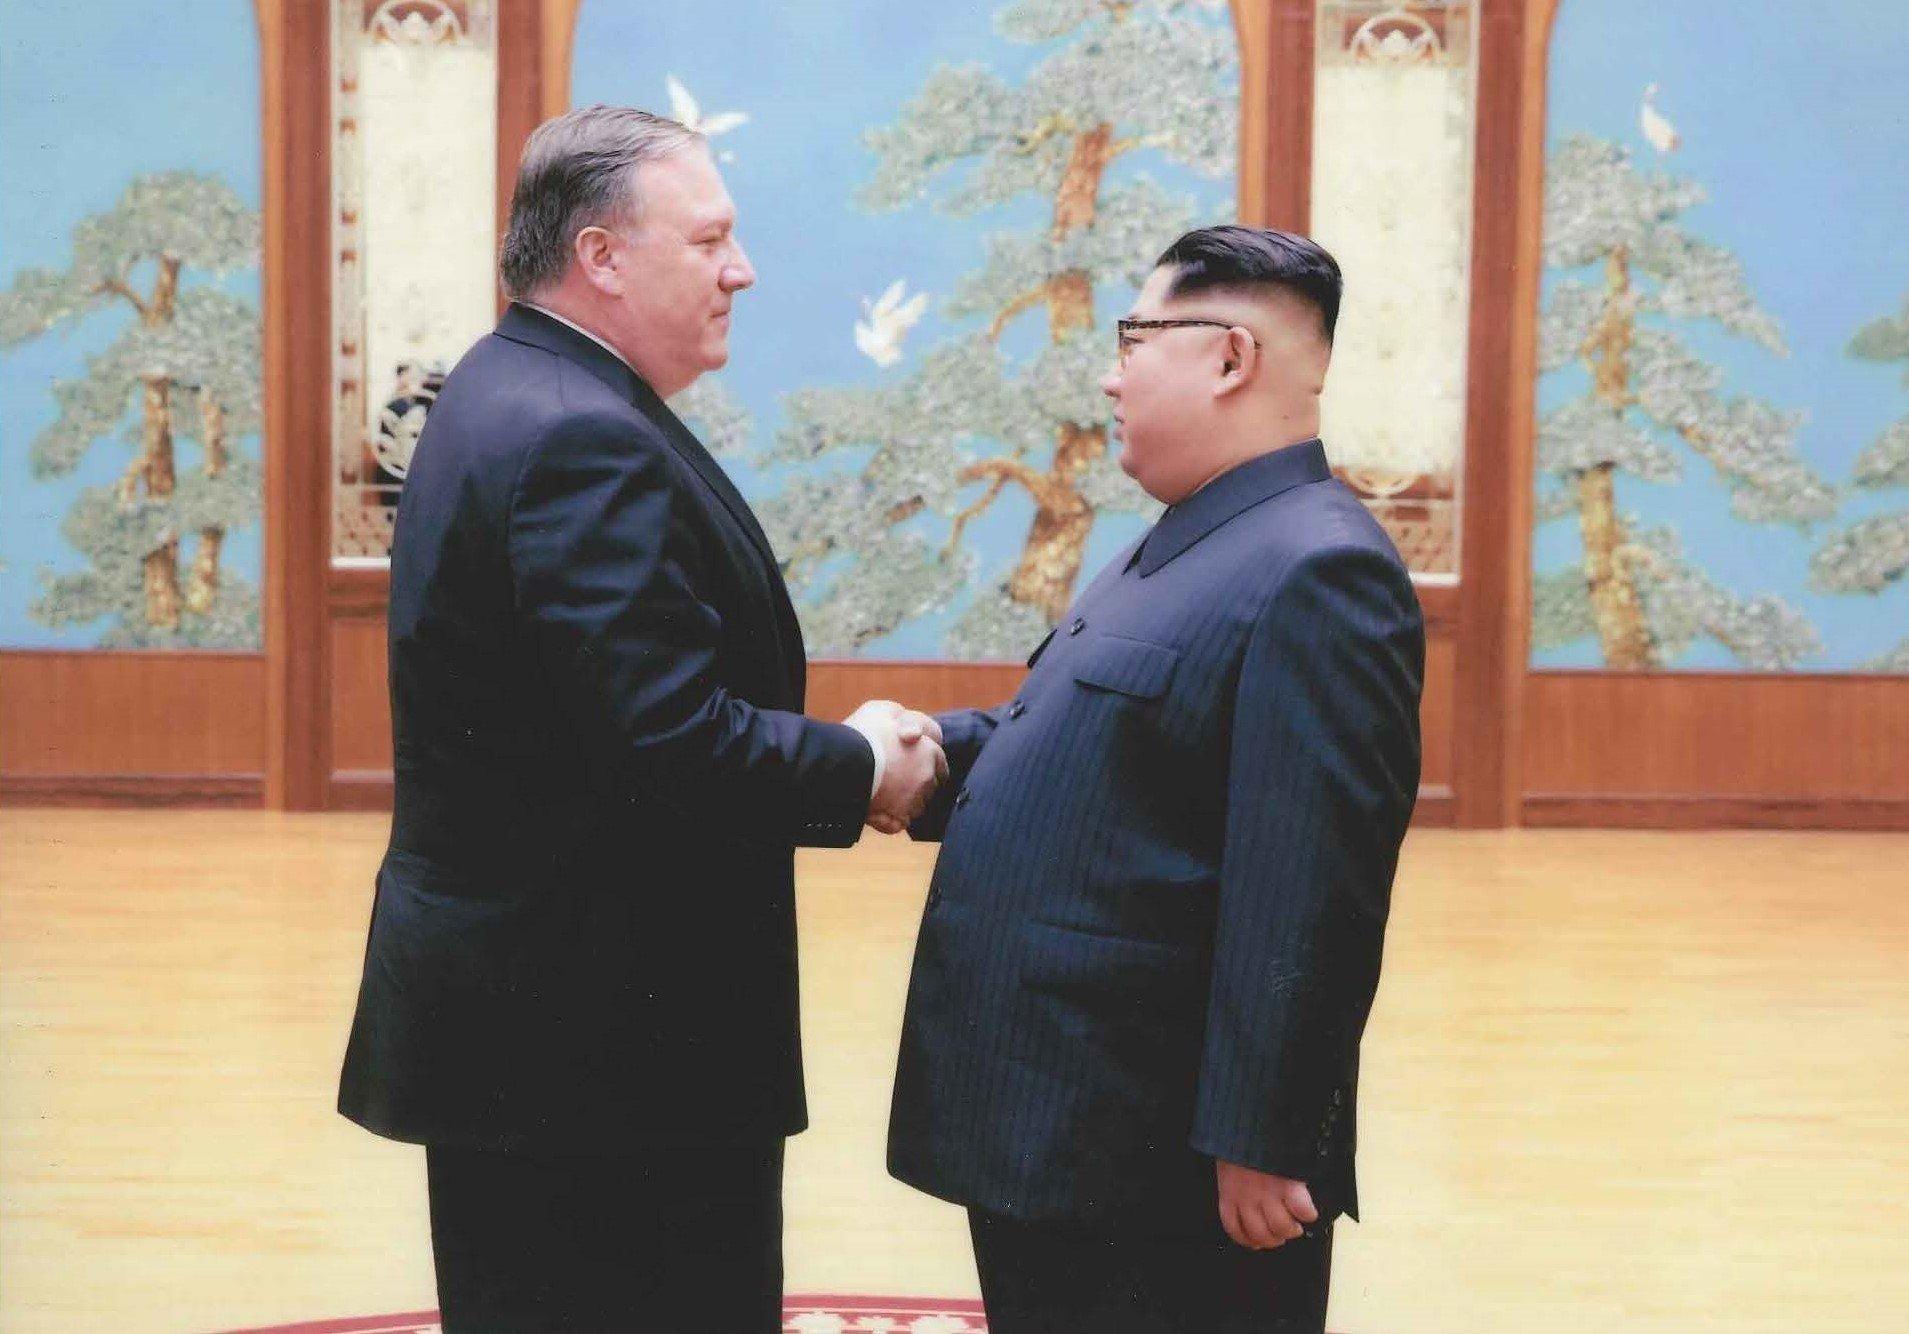 Watch the historic moment Kim Jong-un walked into South Korea